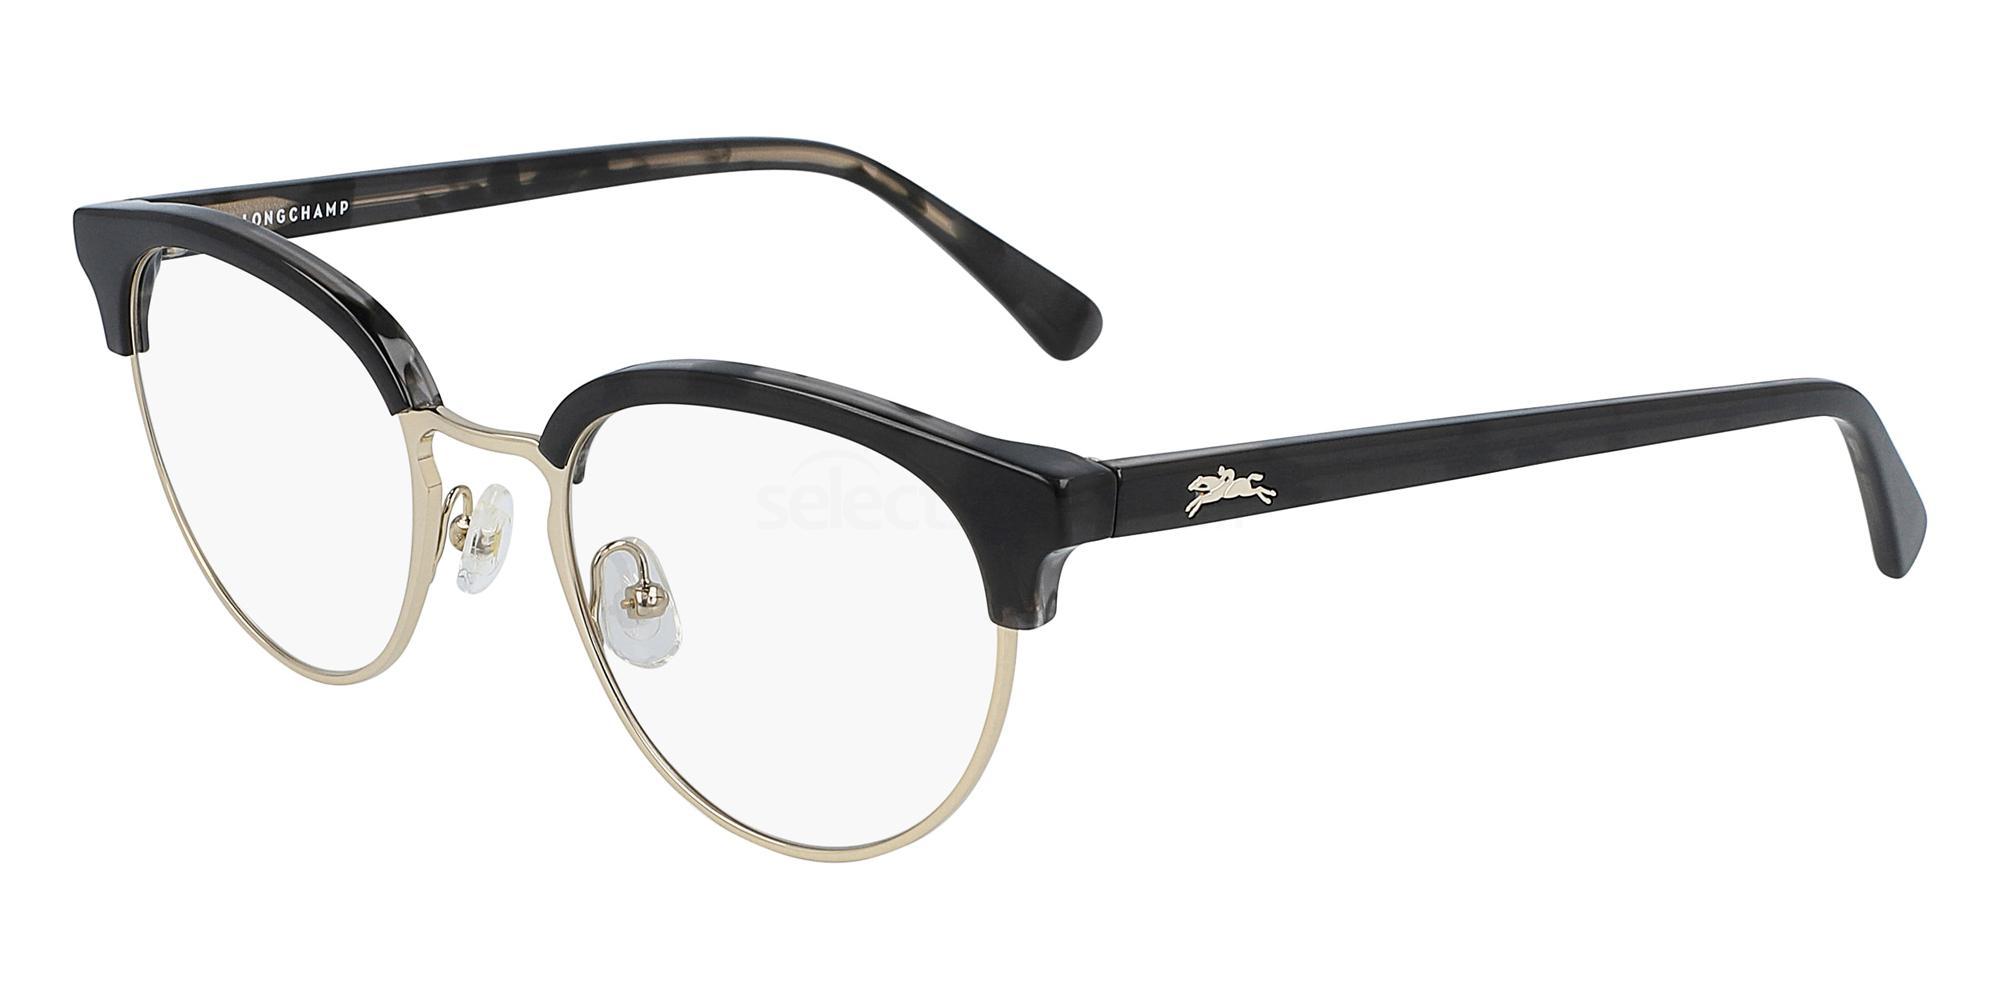 060 LO2126 Glasses, LONGCHAMP